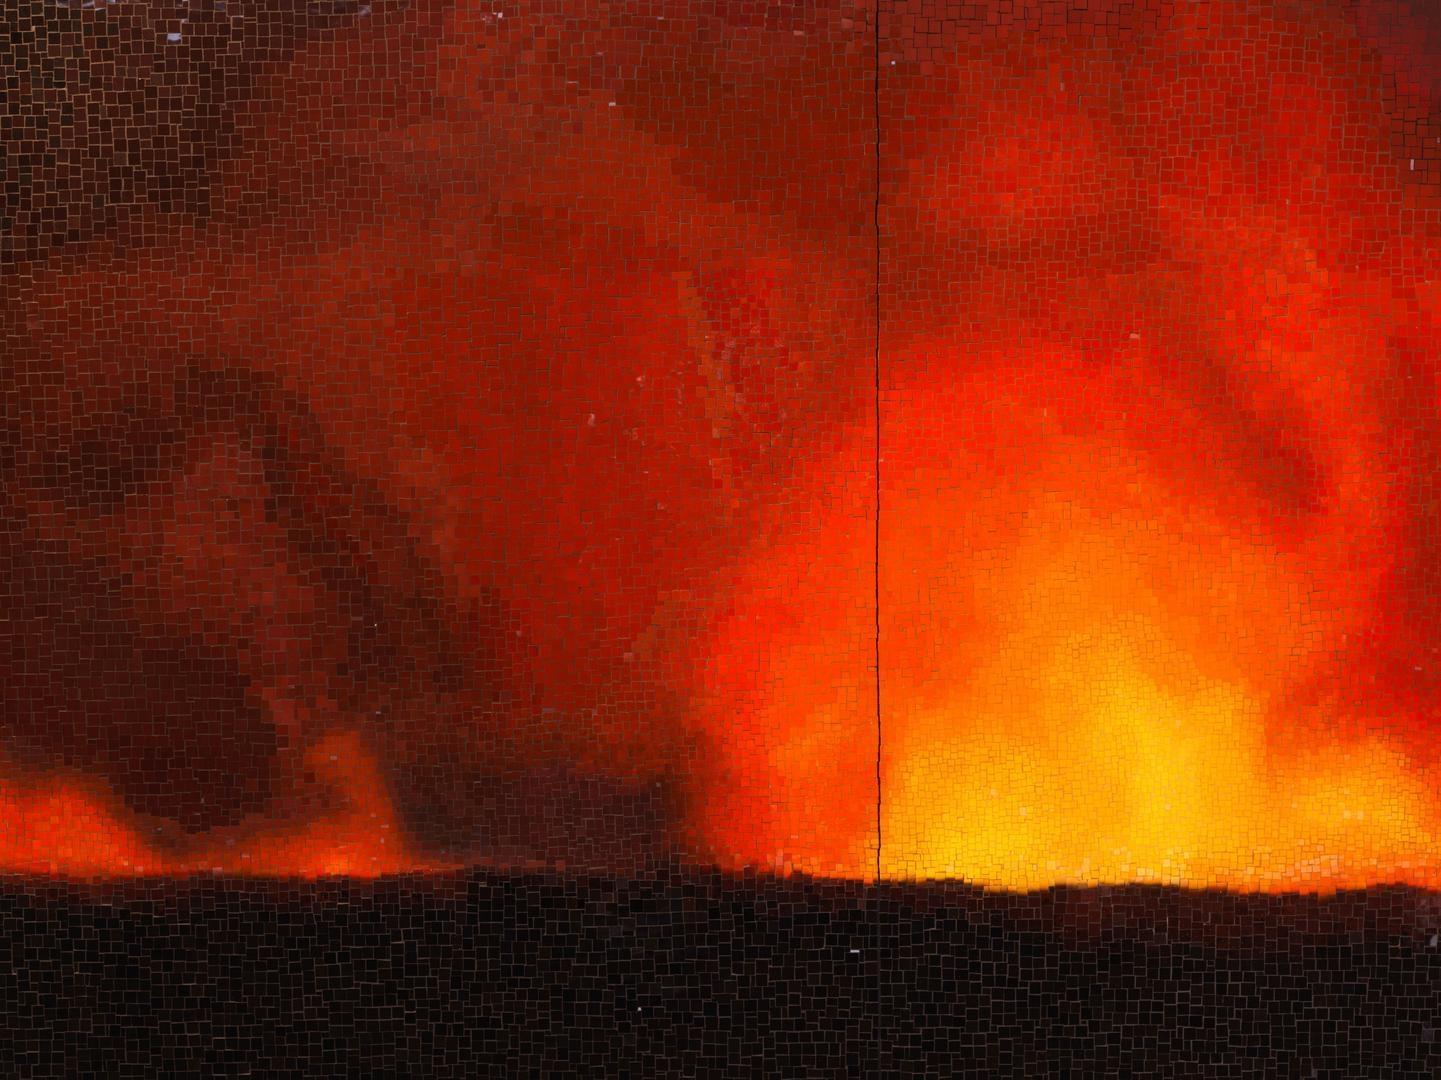 TERESITA FERNÁNDEZ Fire (America) 5(detail), 2016